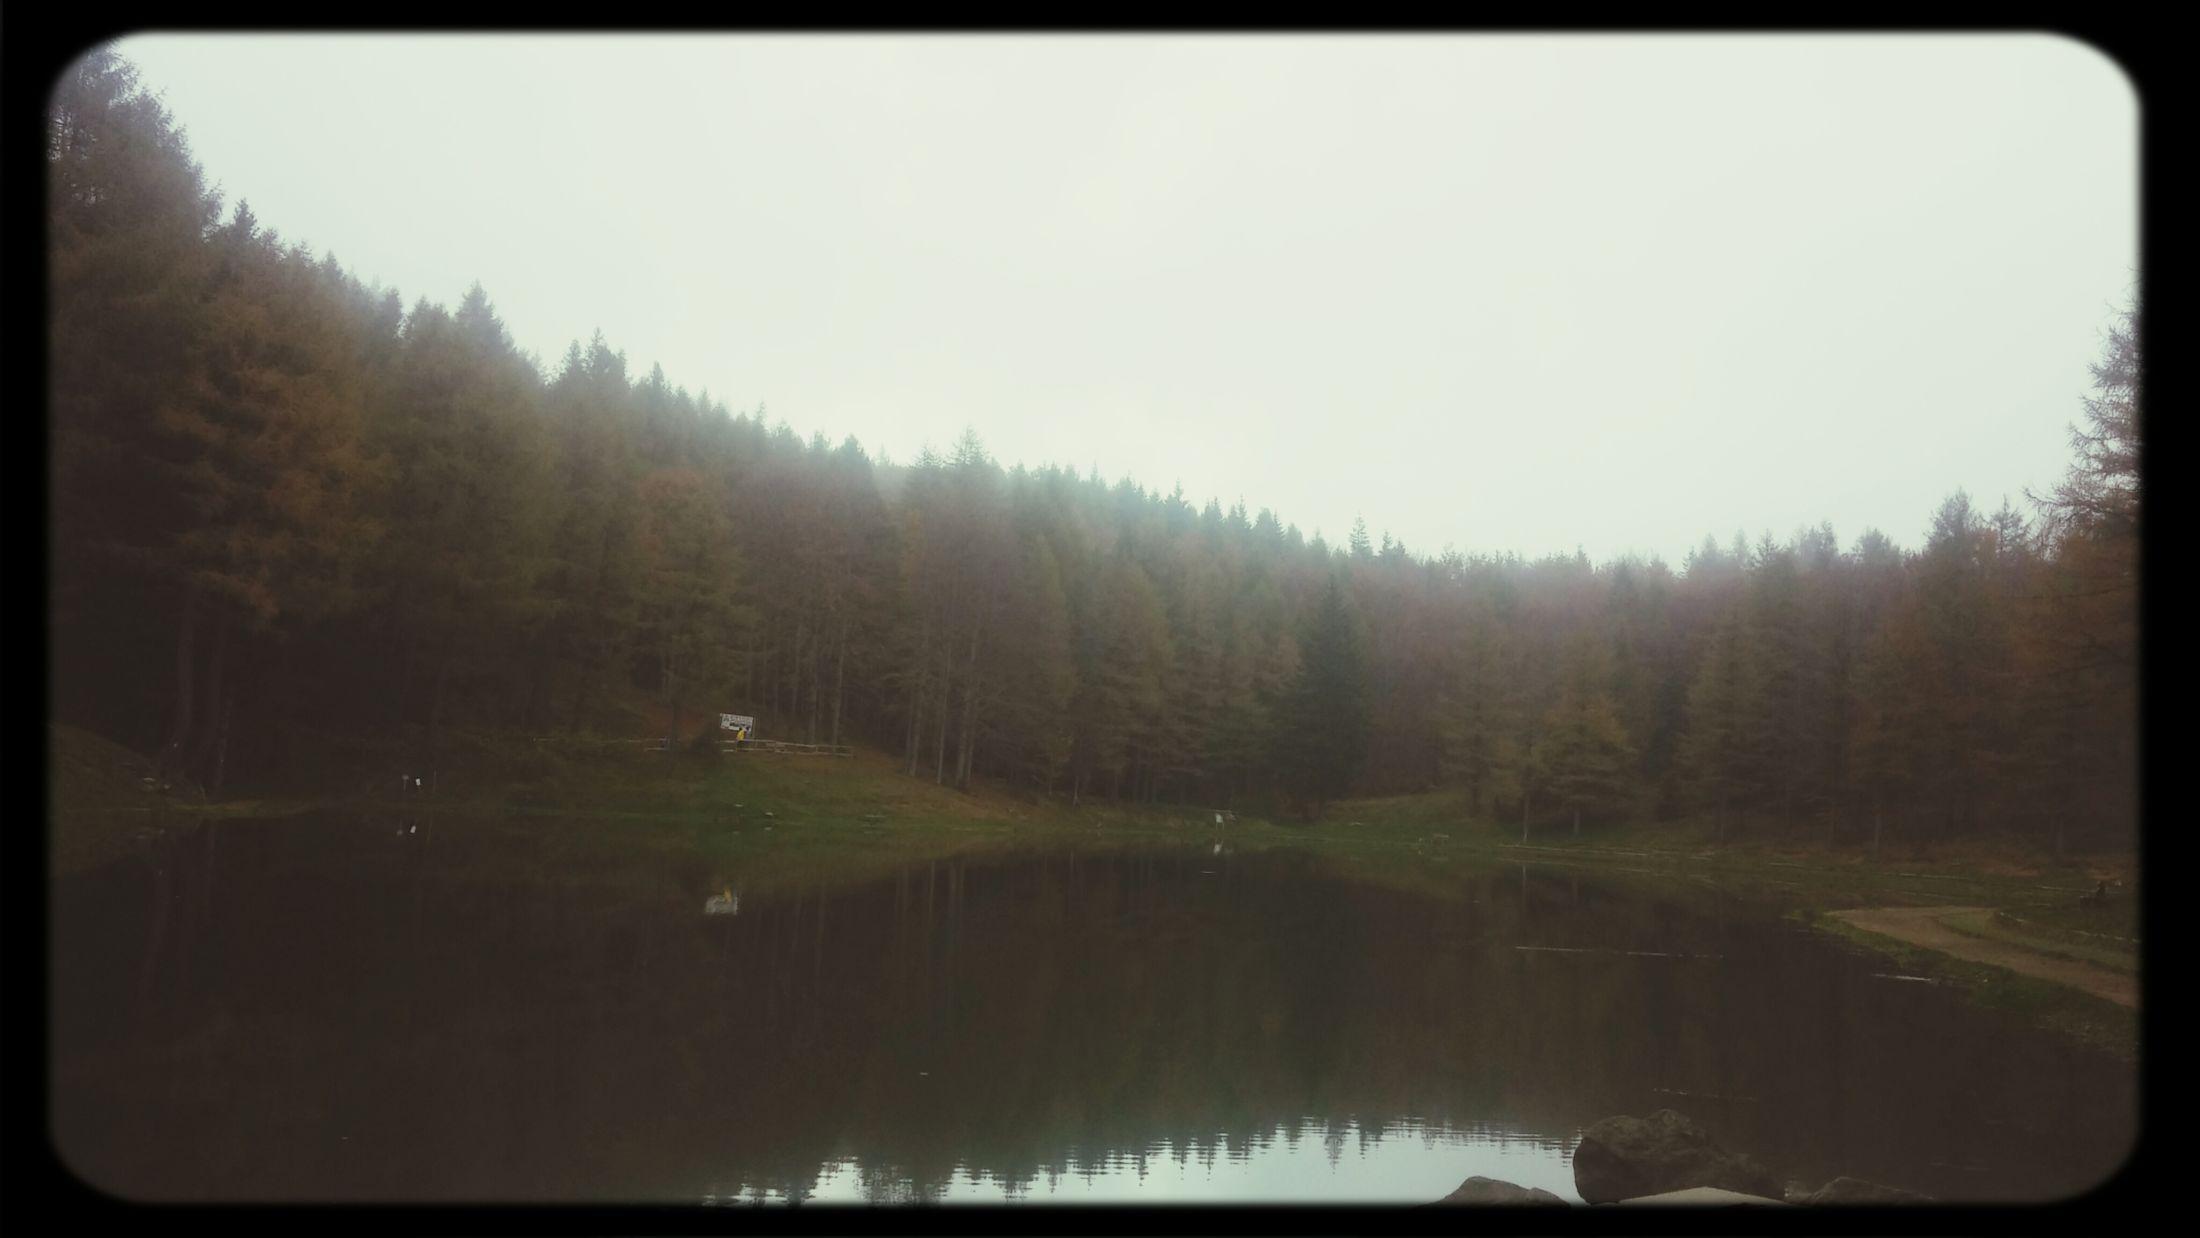 Lago ninfa ❤ Hello World Relaxing Conilmioamore Motorcycles